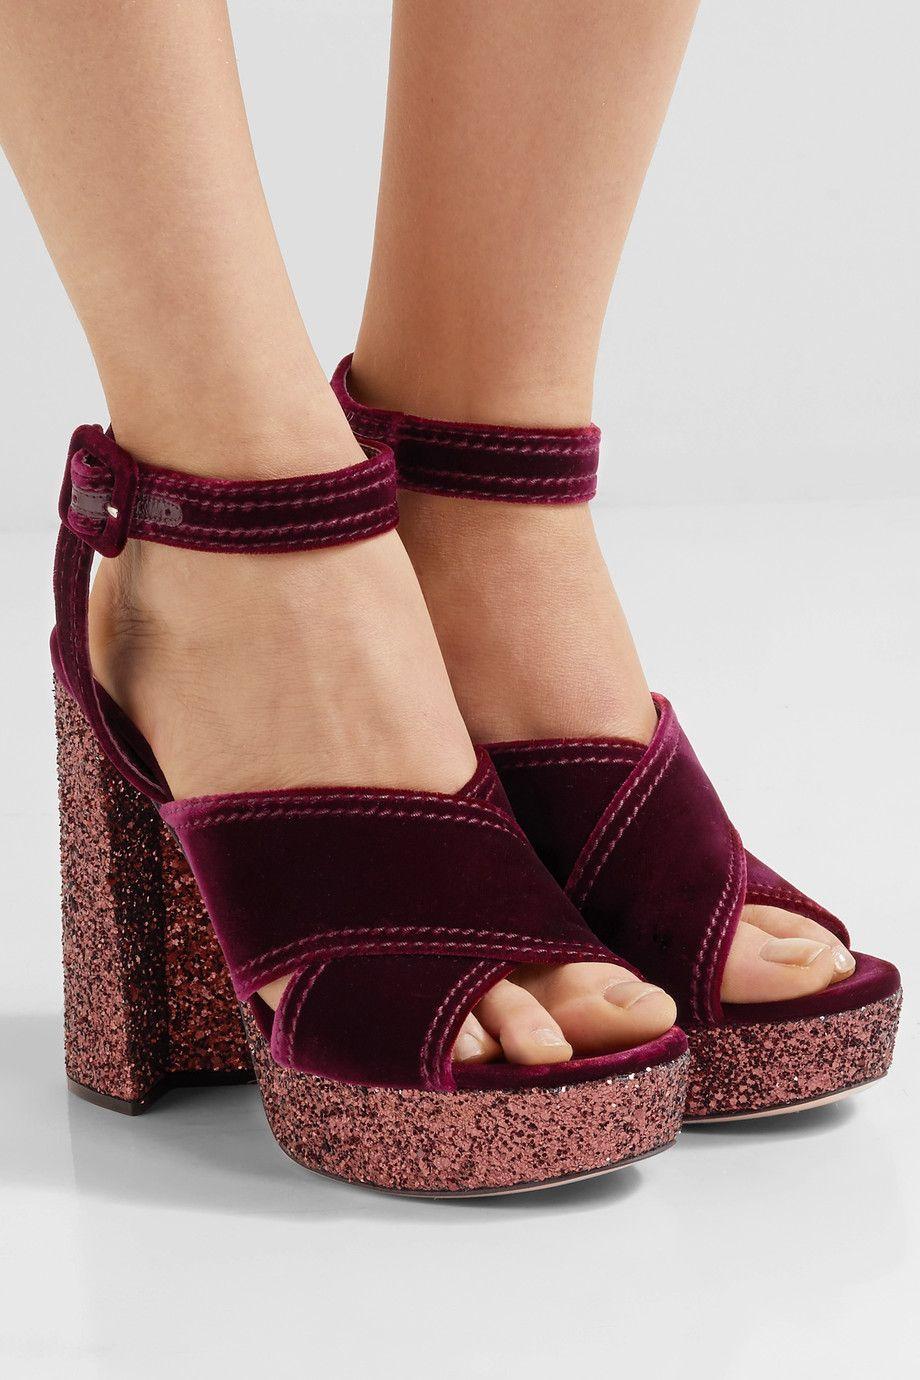 Miu Miu Velvet platform sandals free shipping big sale uQVcYqYx